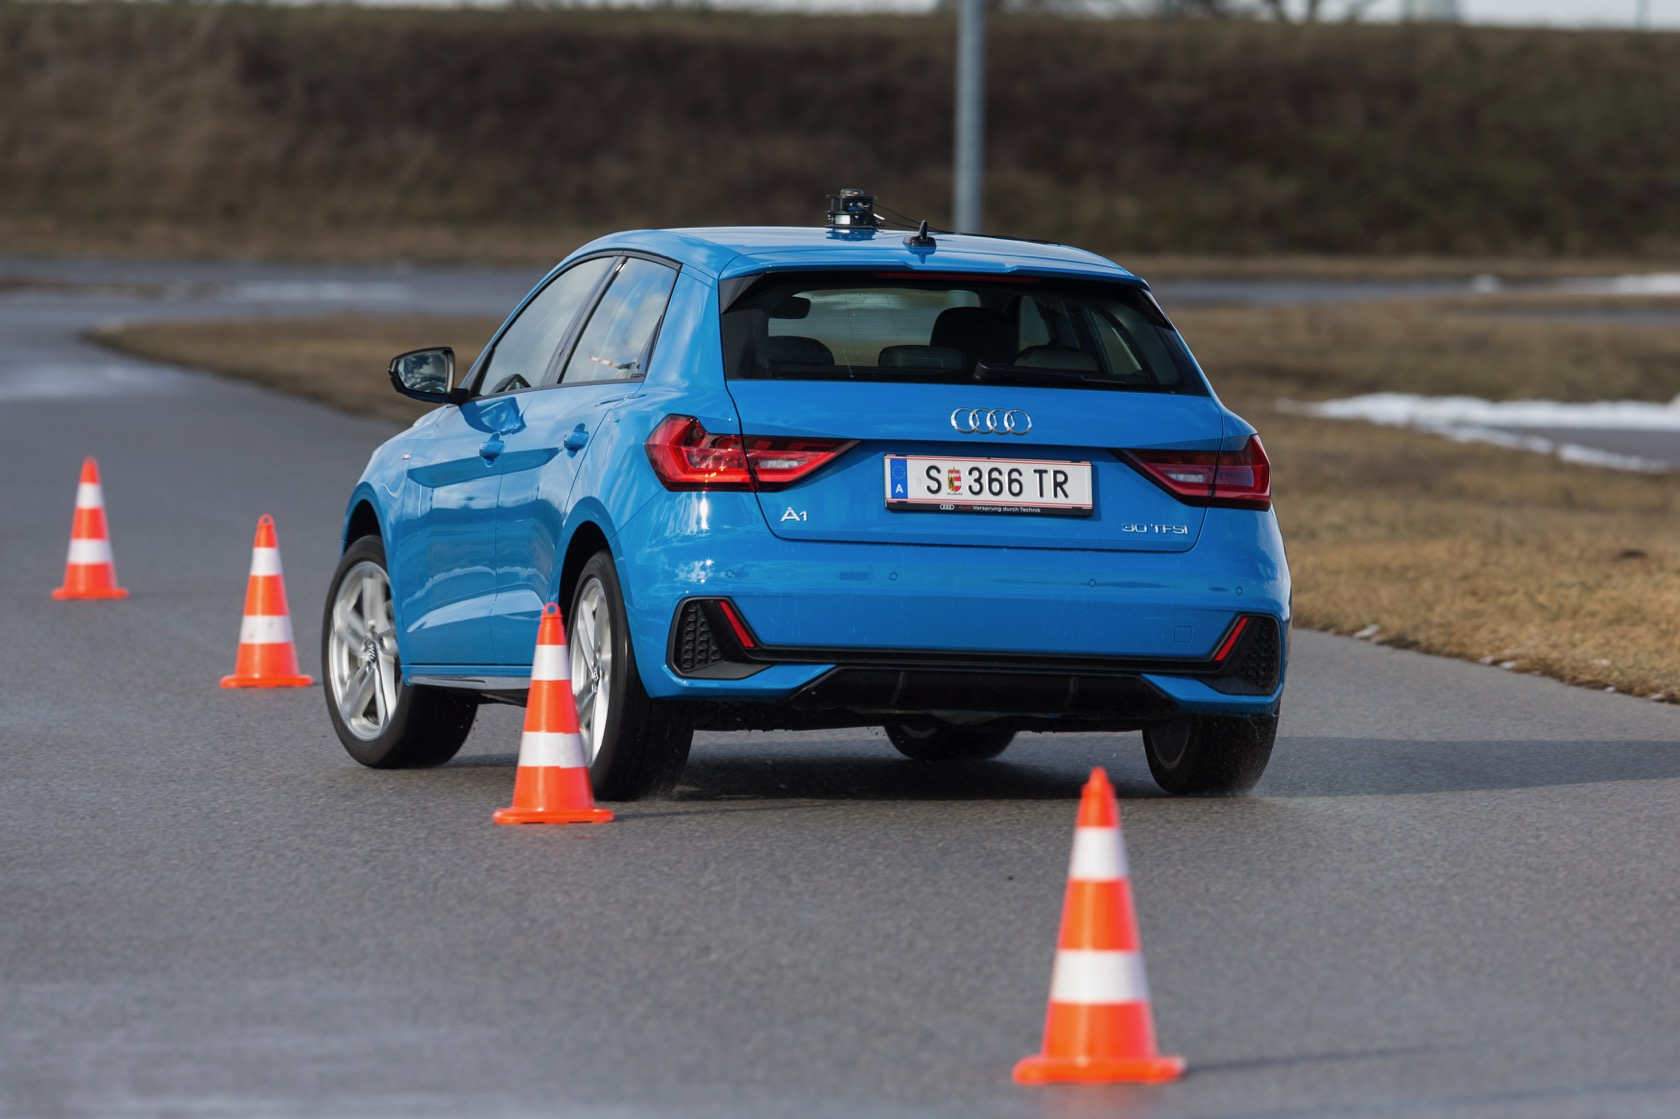 Grosser Test Audi A1 Sportback 30 Tfsi S Line Alles Auto